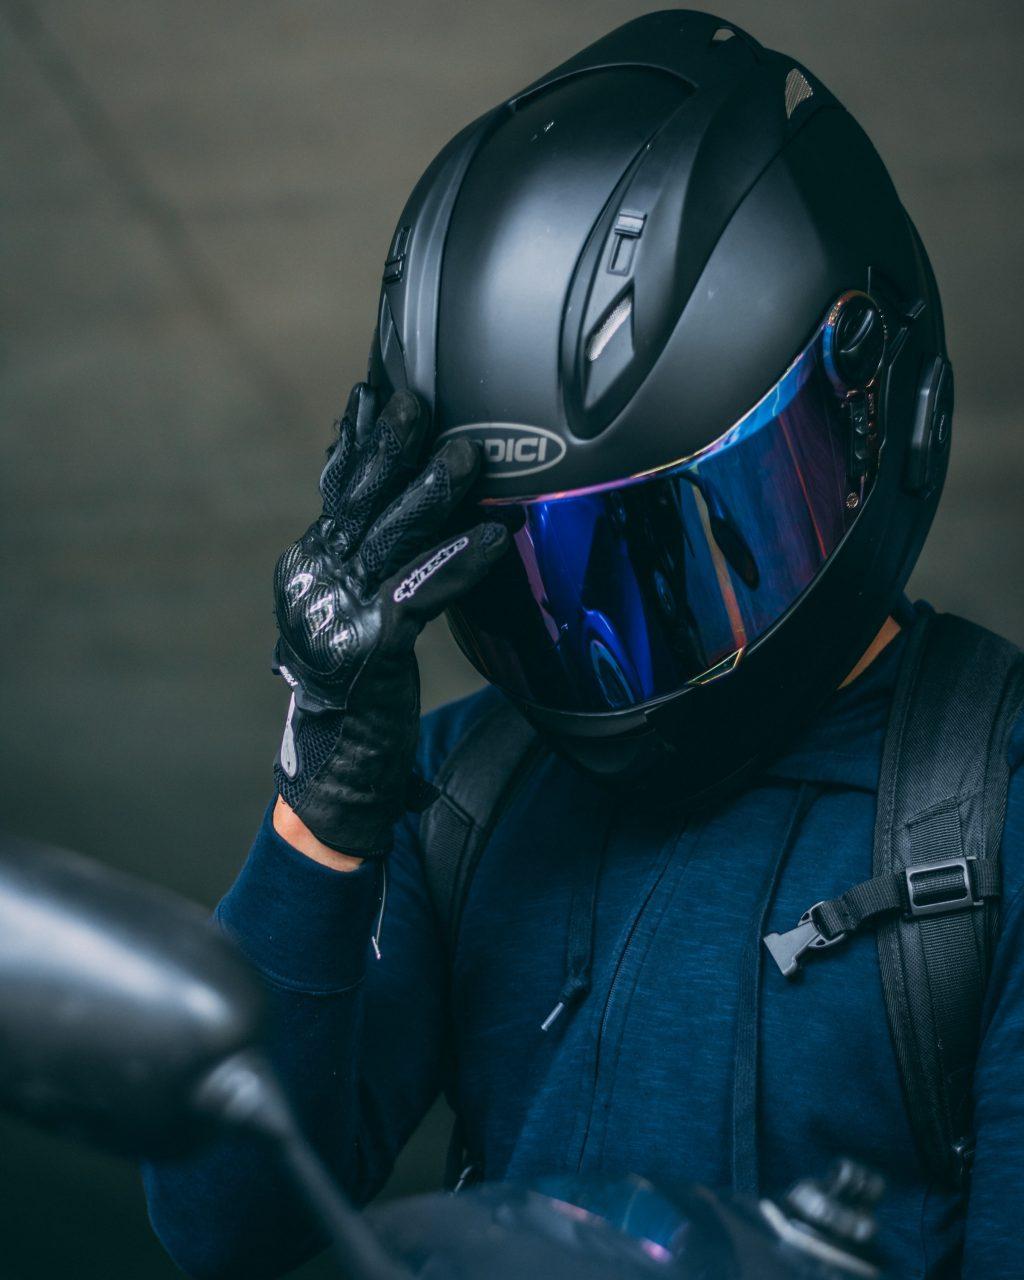 tinted motorcycle visor